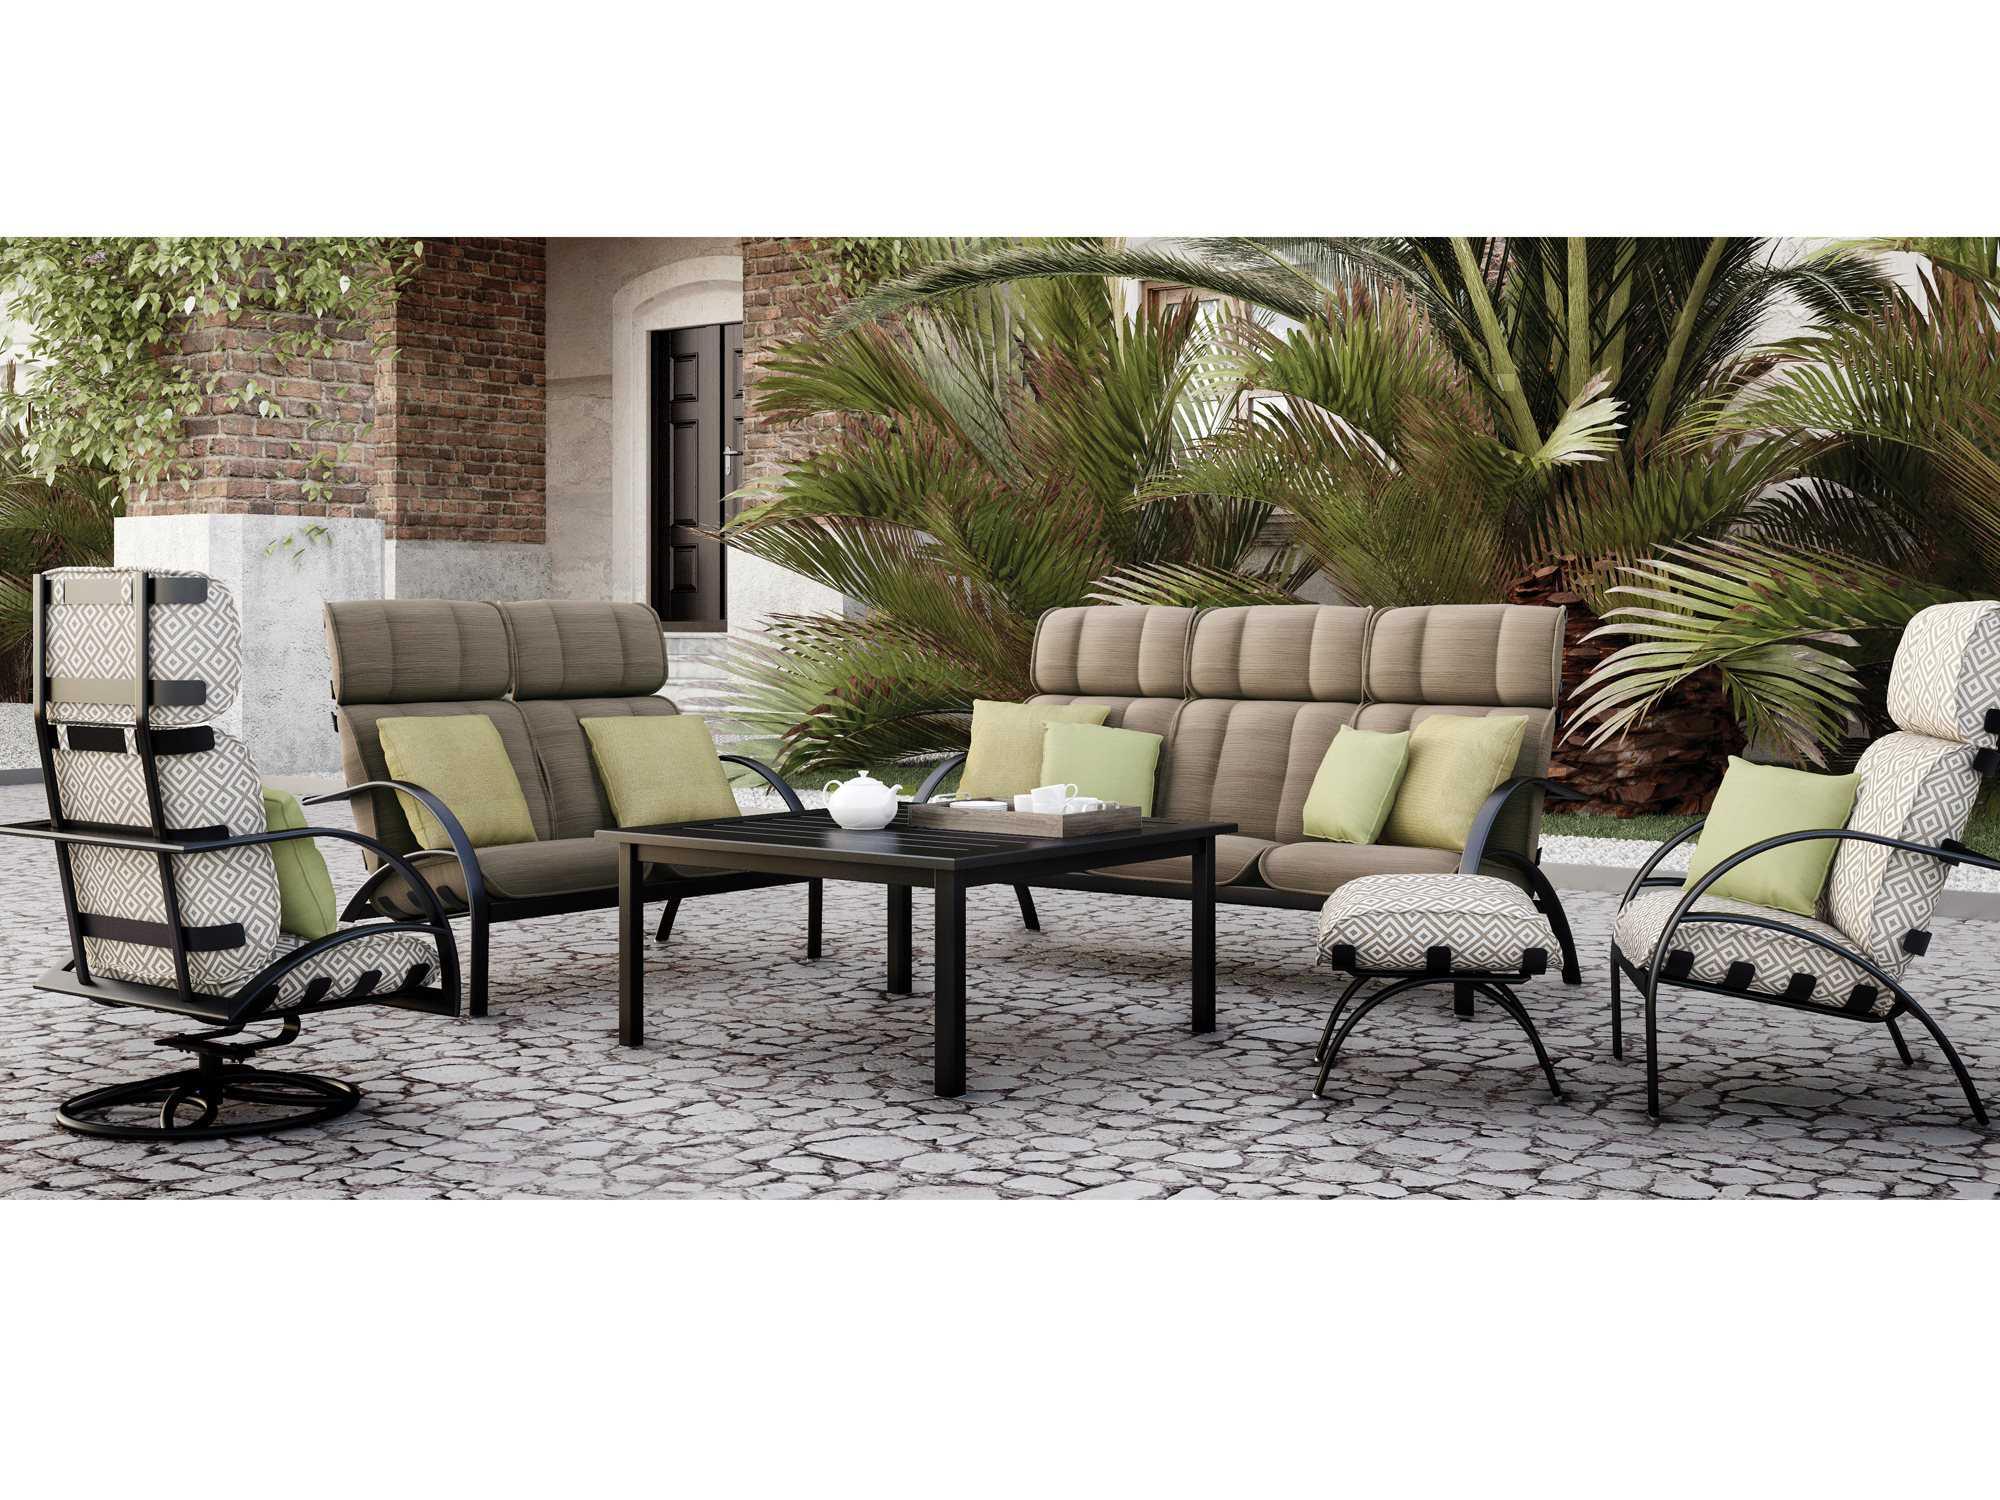 Homecrest Bellaire Aluminum High Back Cushion Arm Patio Lounge Chair B3990